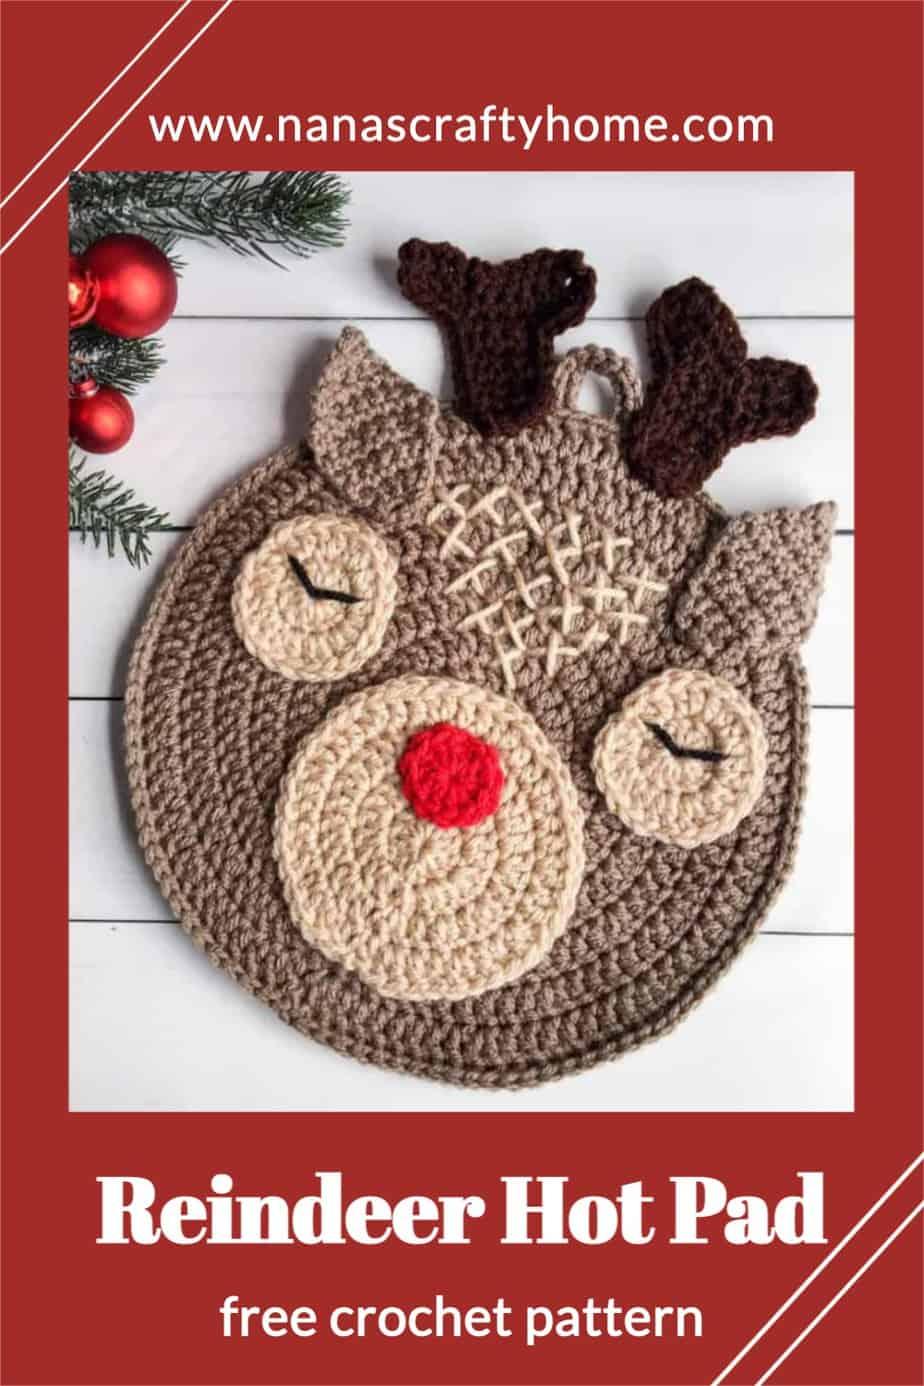 Reindeer Christmas Crochet Hot Pad free crochet pattern